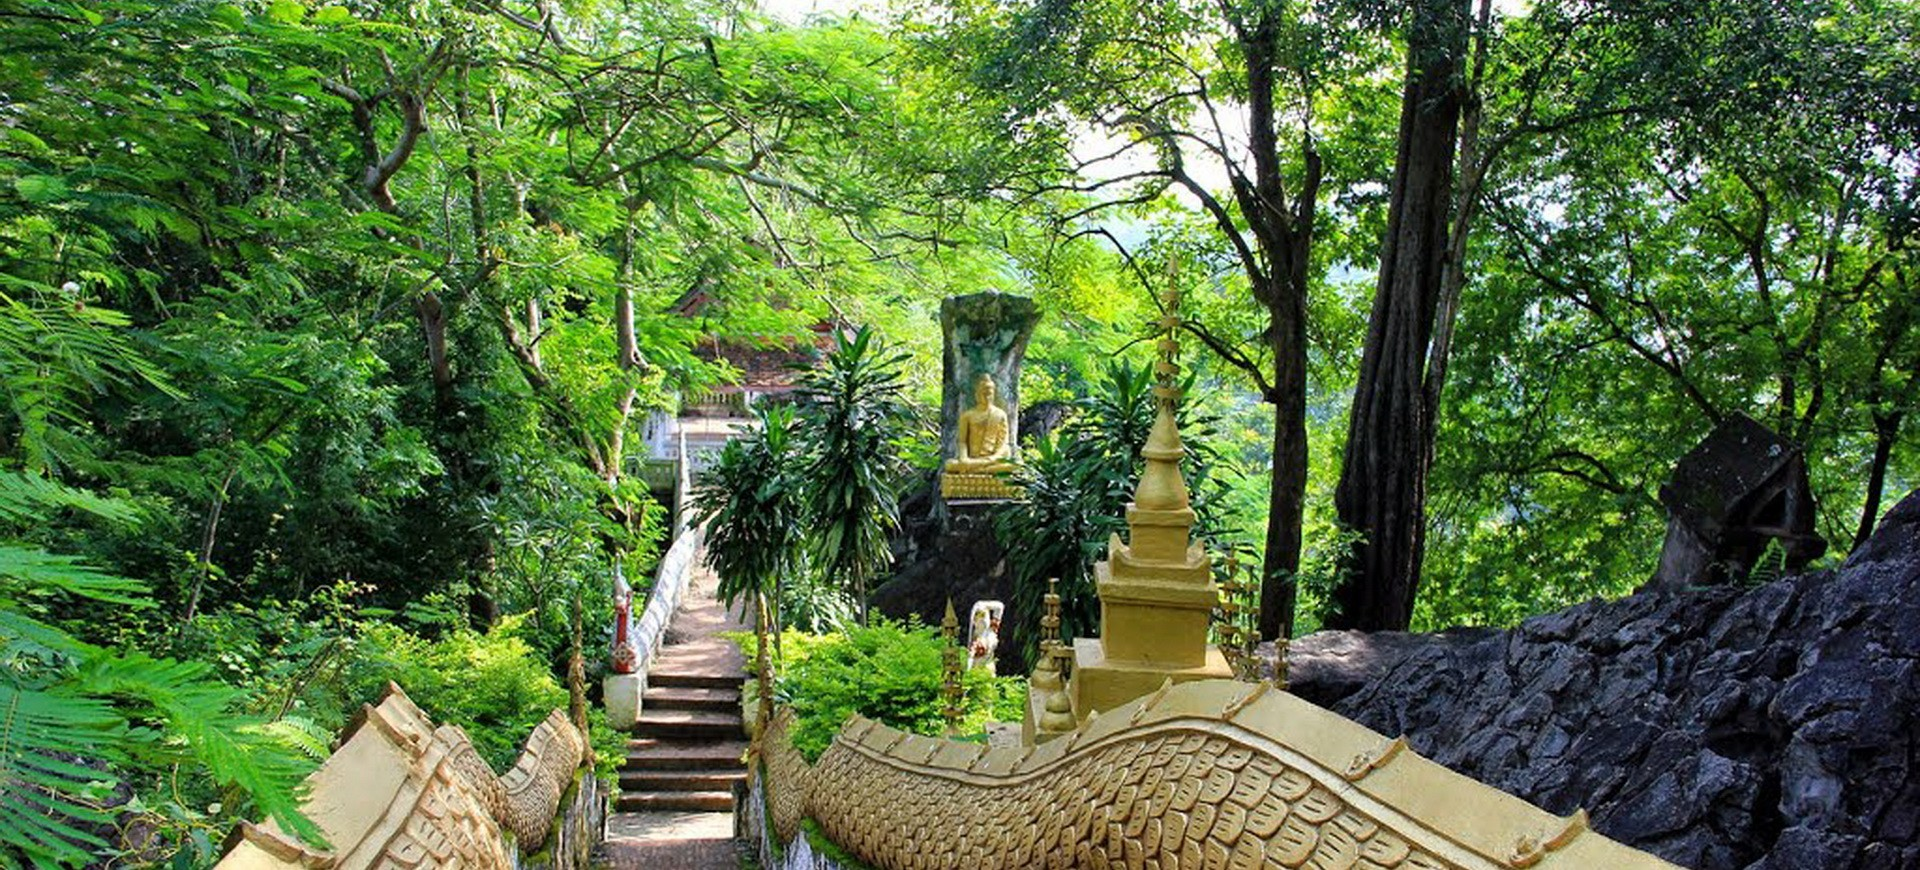 Colline à Phousi Luang Prabang au Laos